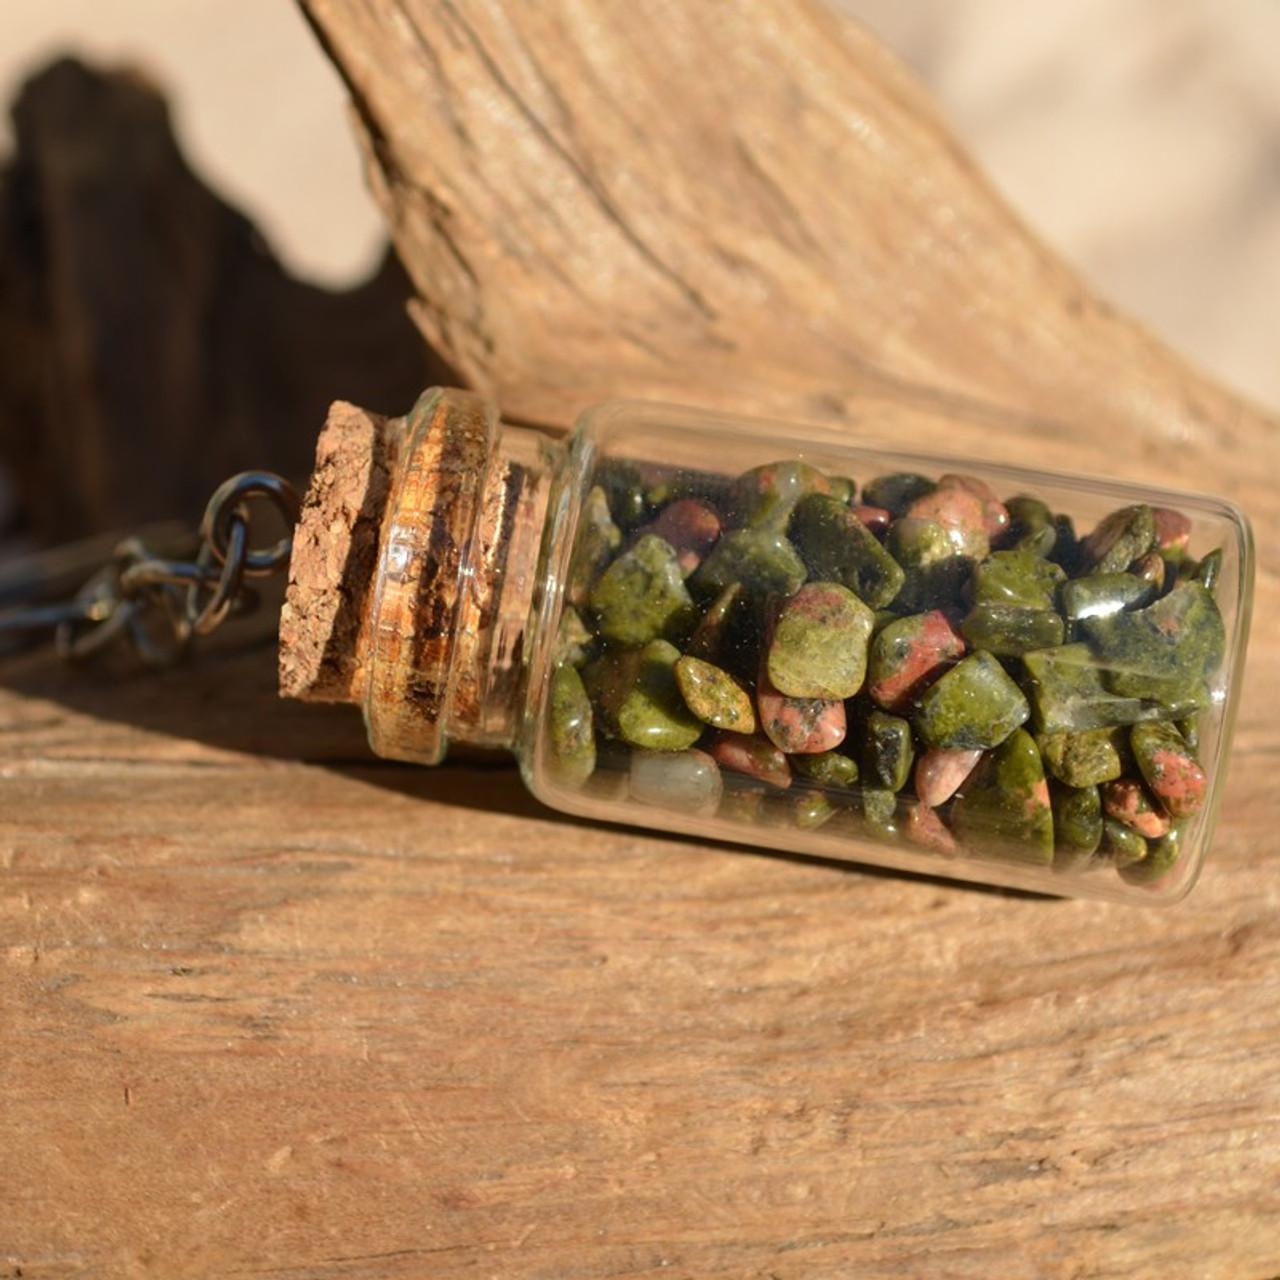 Unakite Jasper Stones in a Glass Vial Keychain